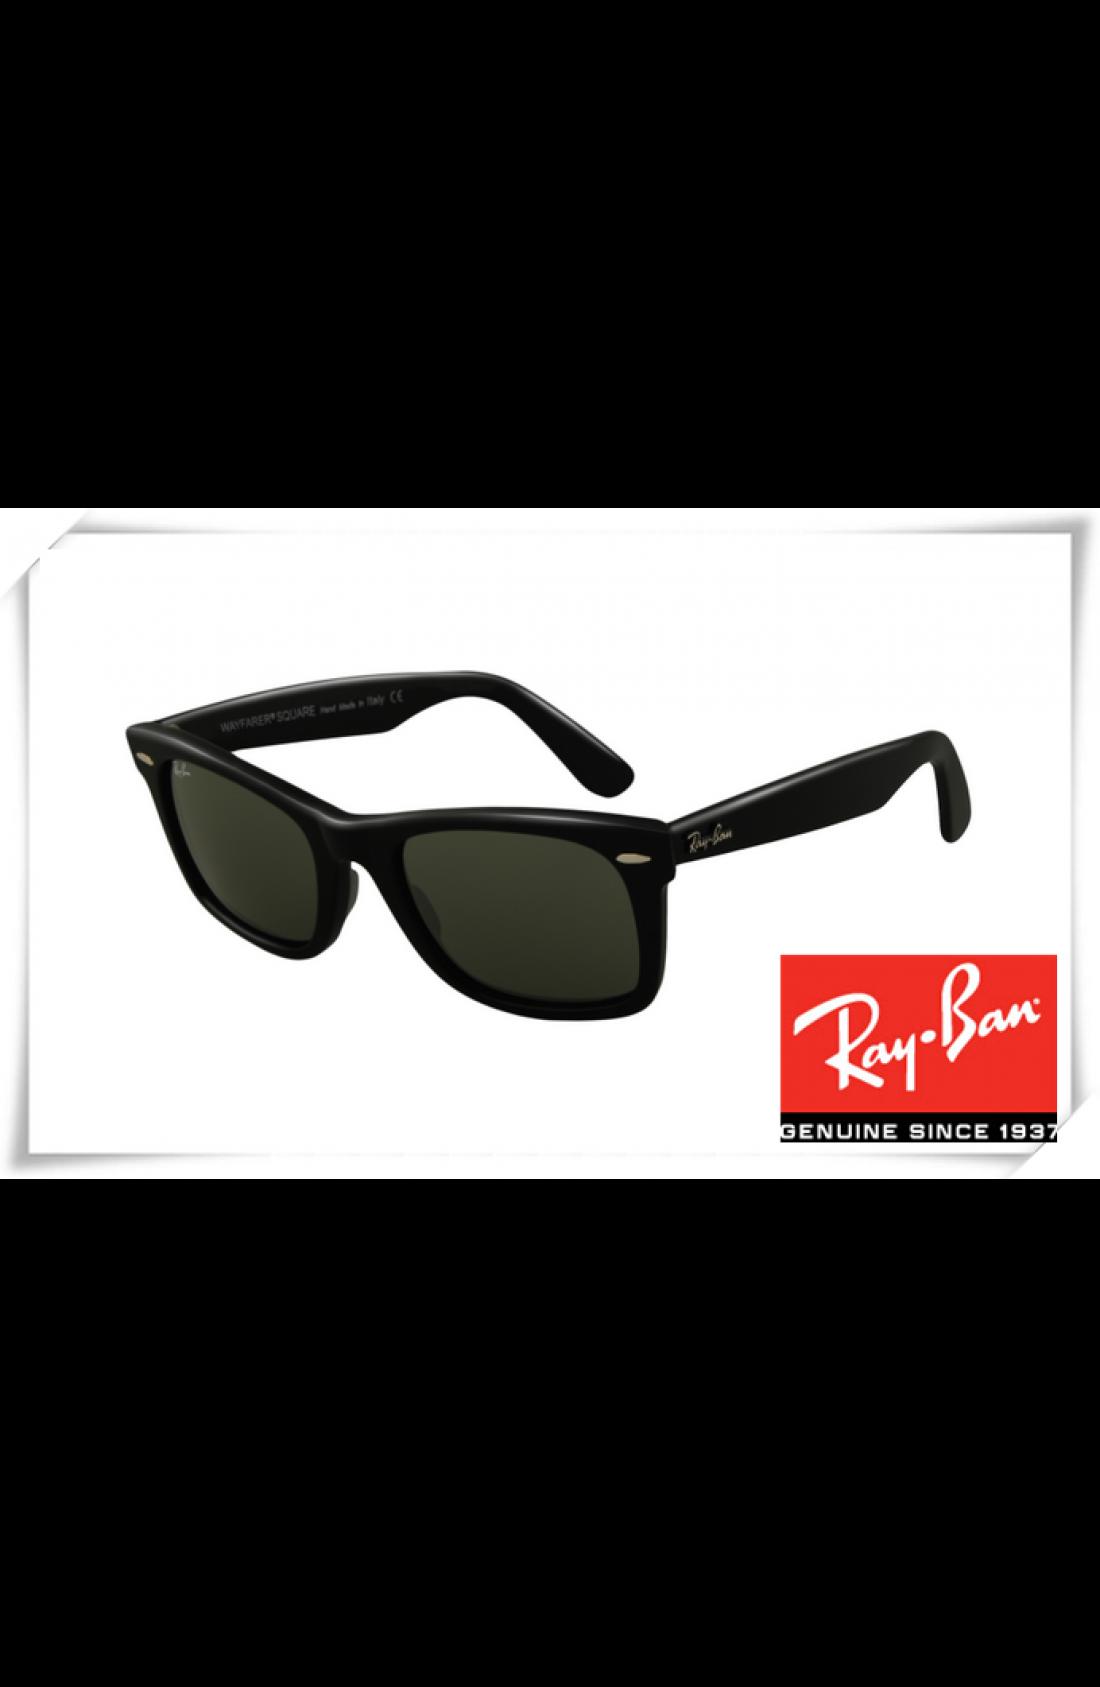 8bfe72fc0e Cheap Fake Ray Ban RB2151 Square Wayfarer Sunglasses Black Frame ...